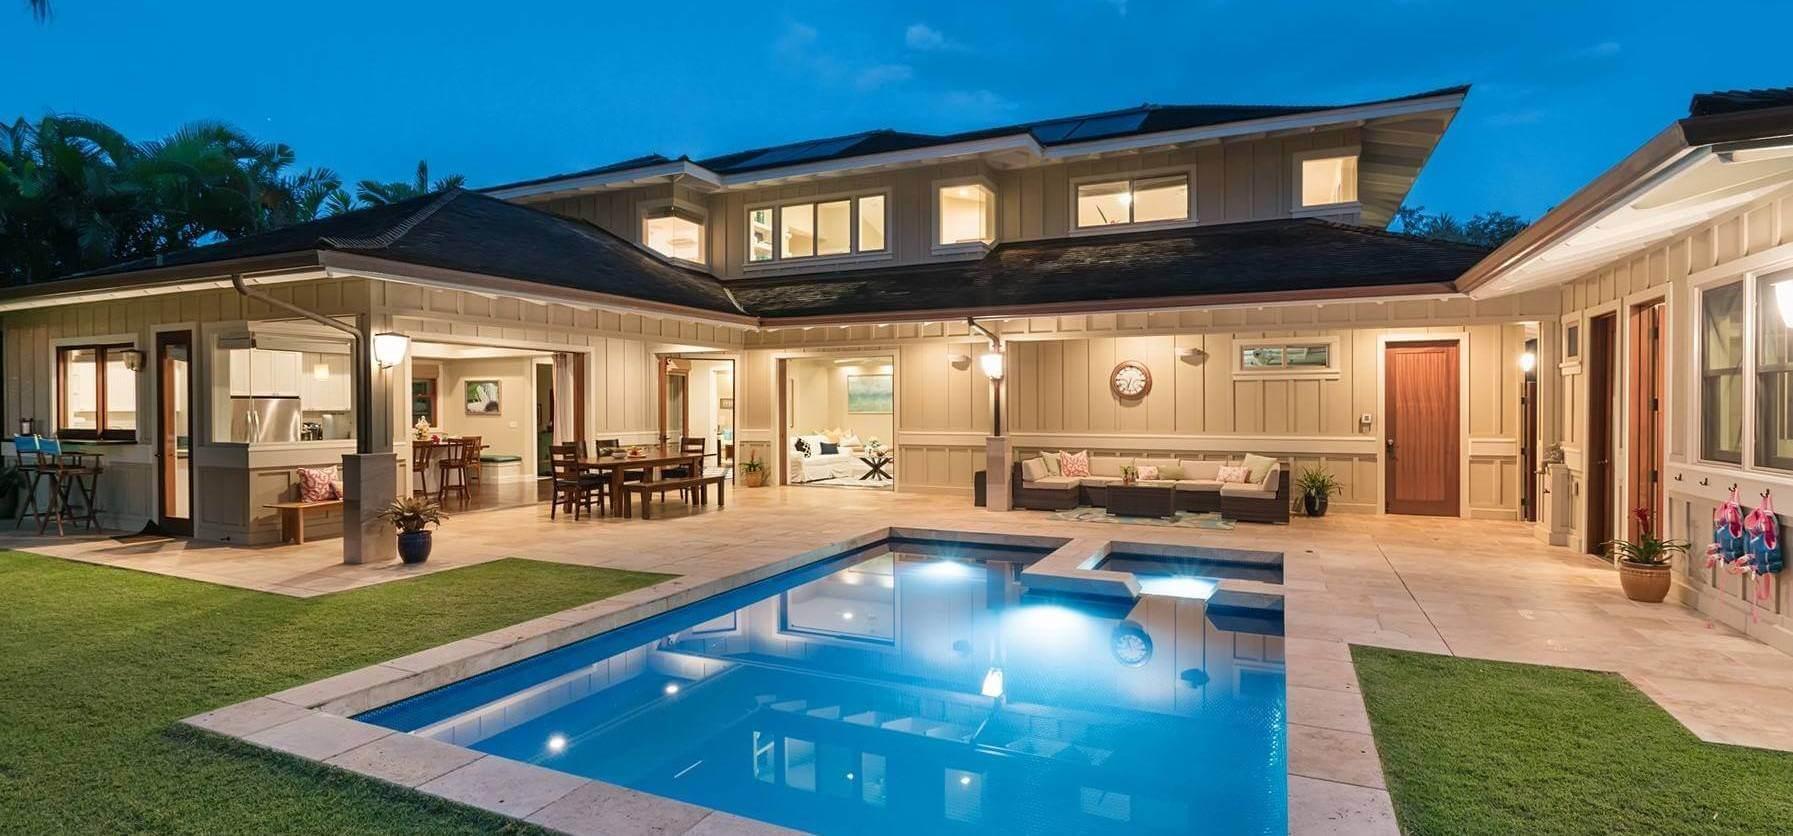 Real Estate Agent Ewa Beach